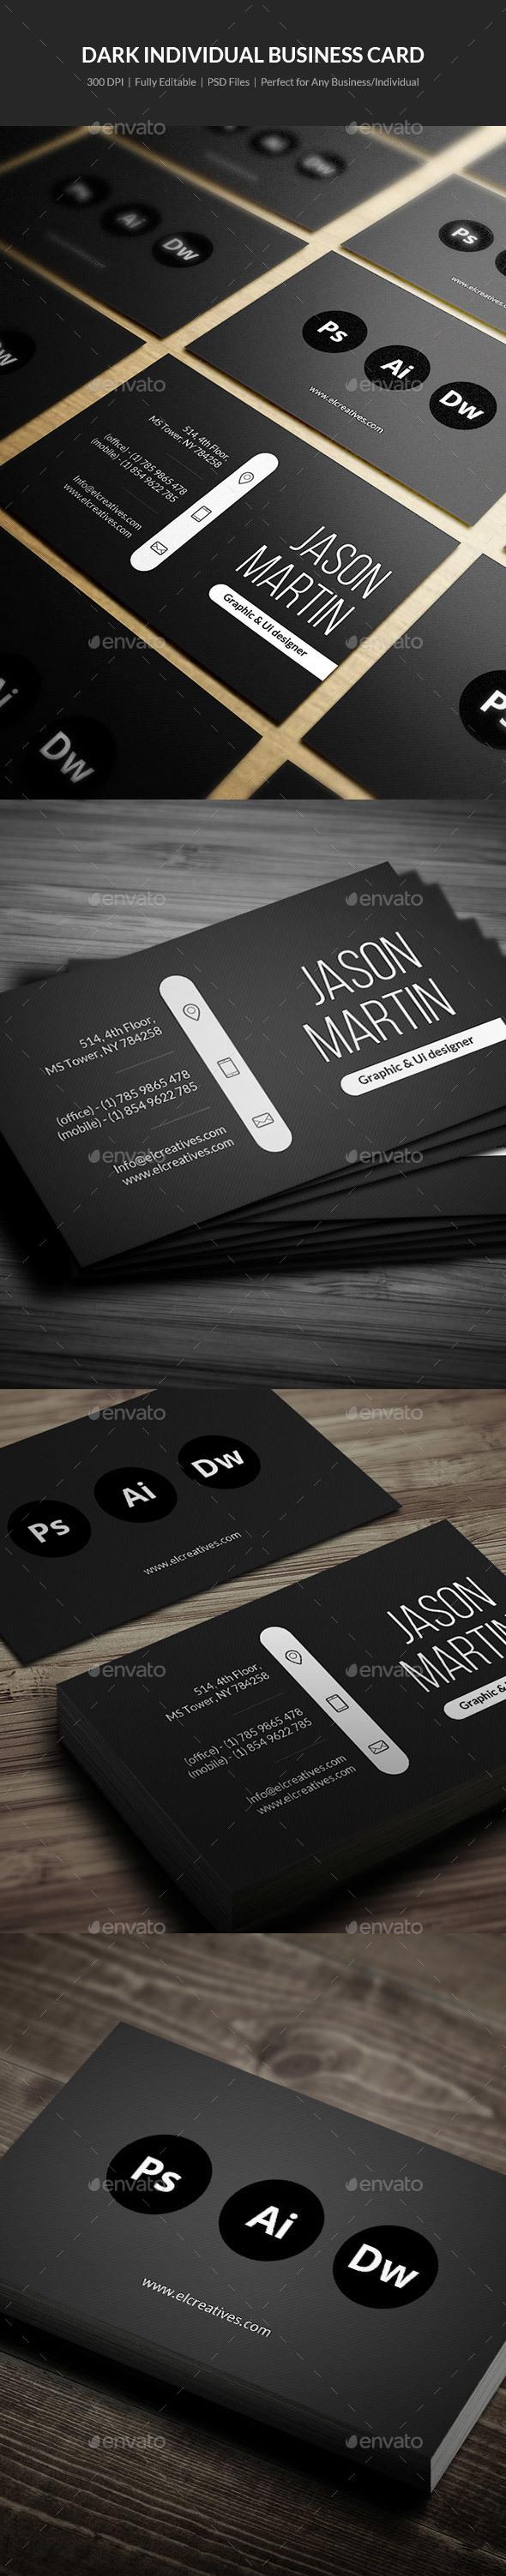 Dark Individual Business Card - 05 - Creative Business Cards